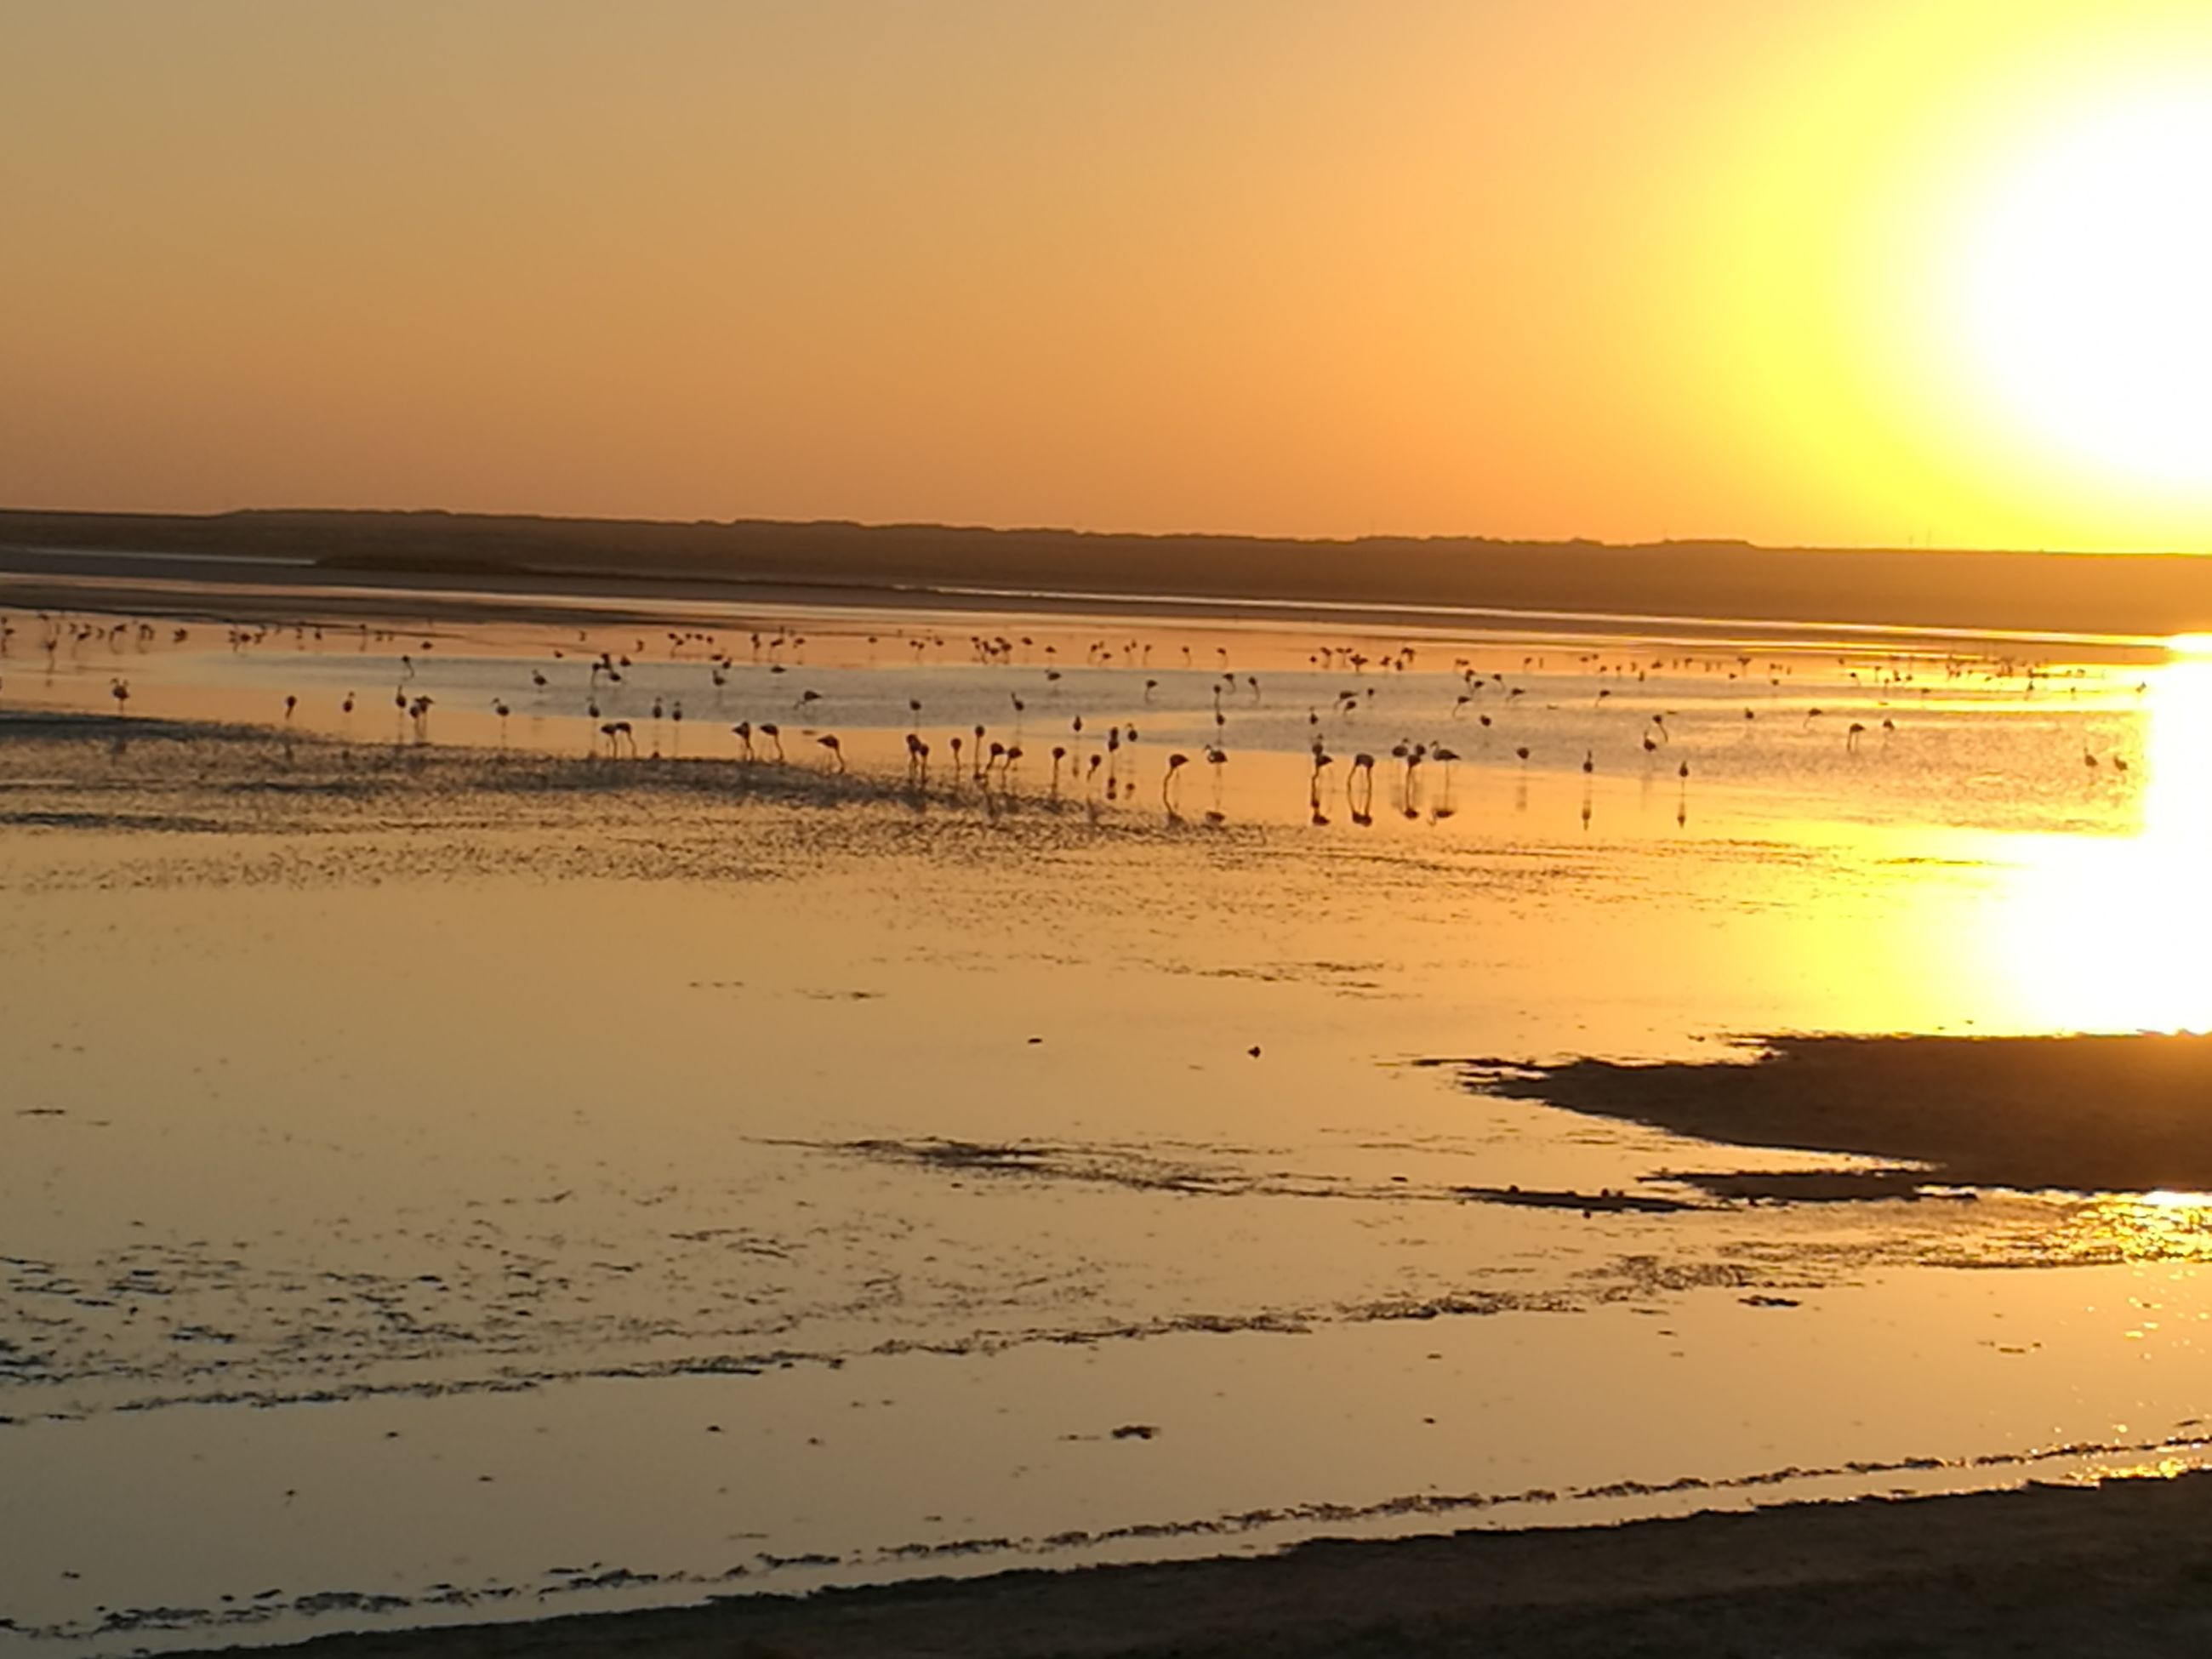 sunset, sun, water, scenics, tranquility, orange color, tranquil scene, sea, beach, beauty in nature, majestic, silhouette, idyllic, ocean, nature, seascape, reflection, calm, non-urban scene, atmosphere, sunbeam, vacations, sky, romantic sky, coastline, distant, horizon, shore